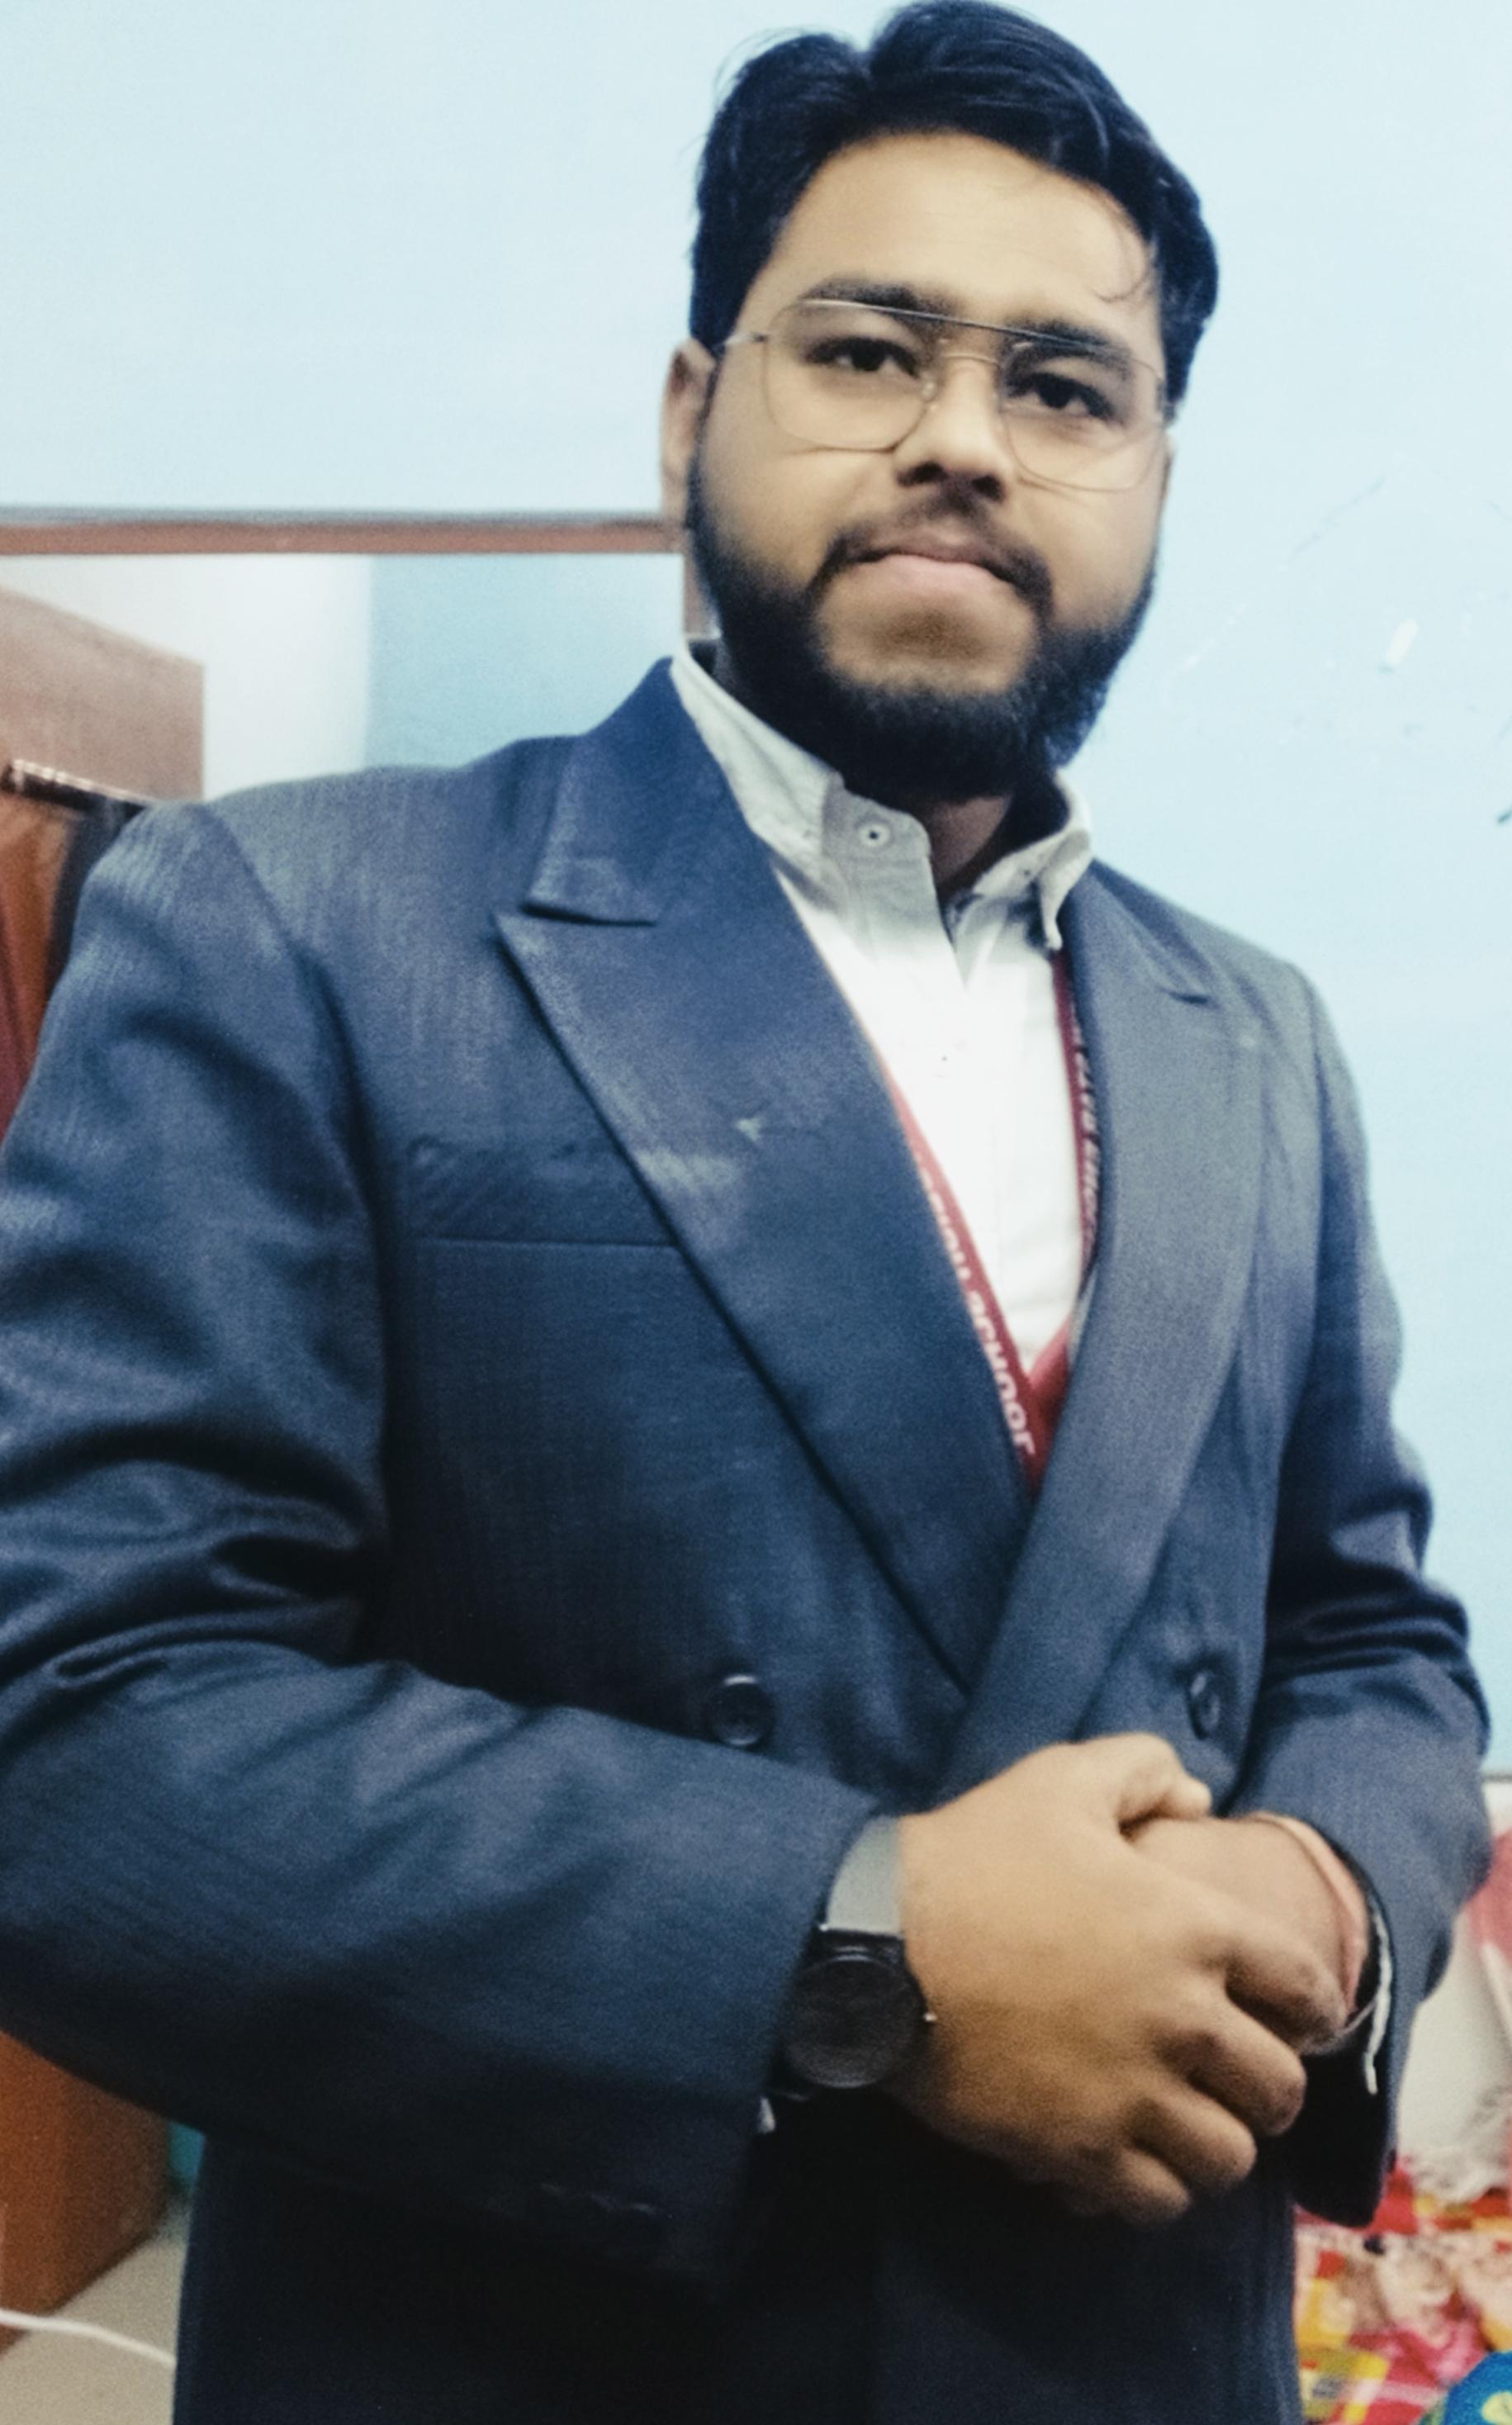 Sudhanshu Ranjan Singh